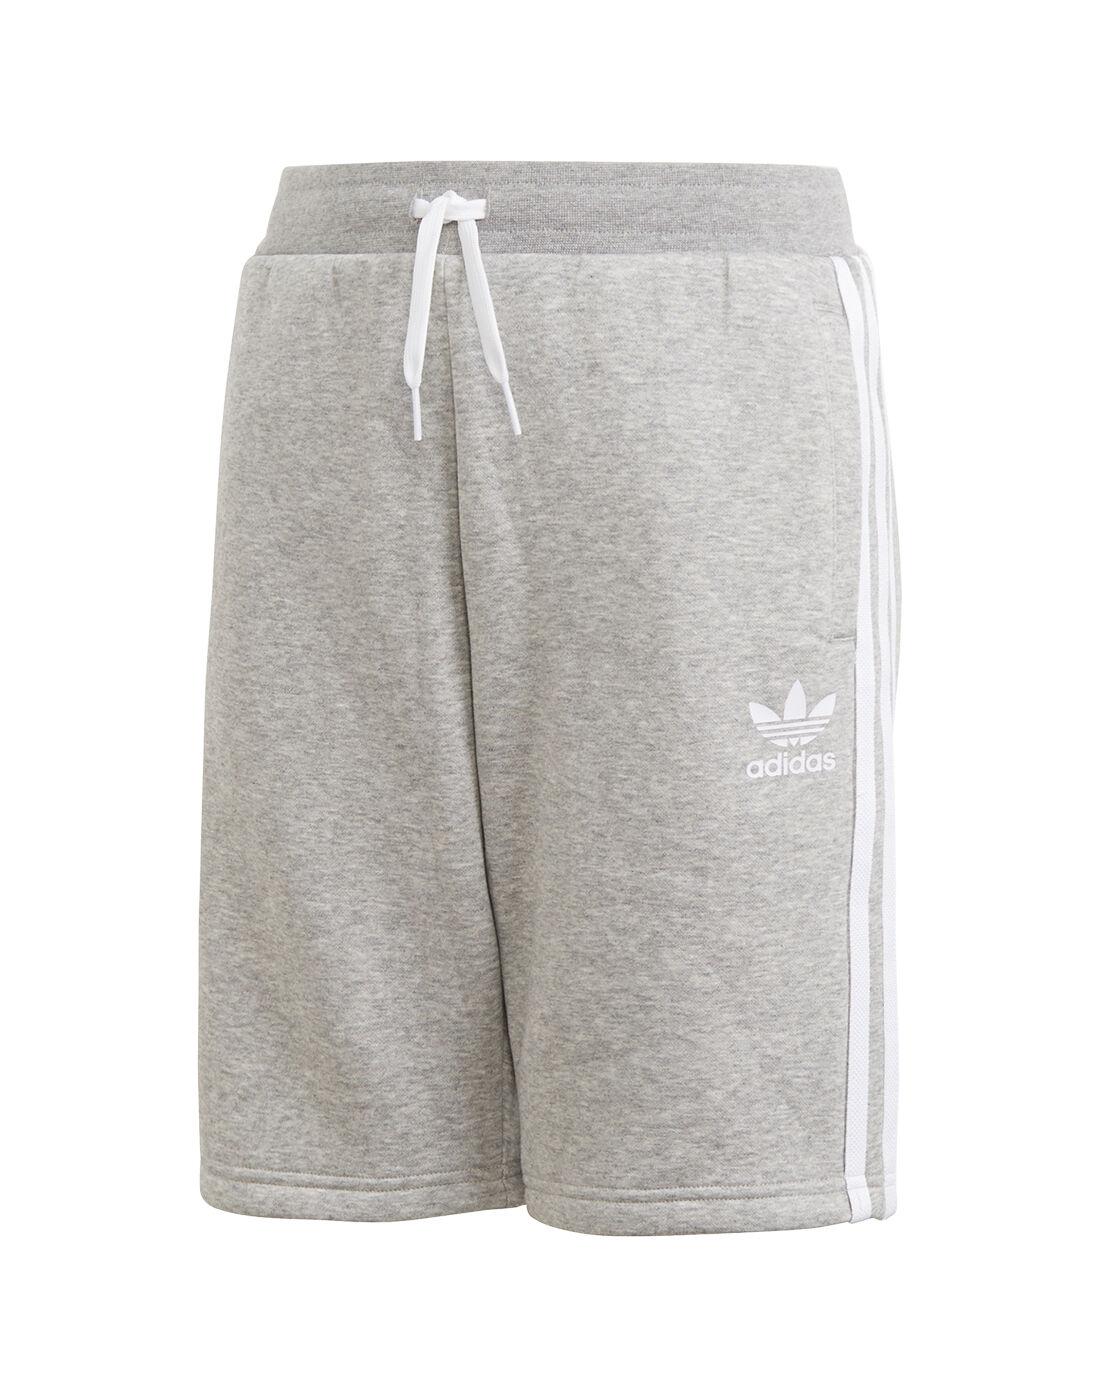 Older Shorts Adidas Boys Originals Trefoil OPkn0Xw8